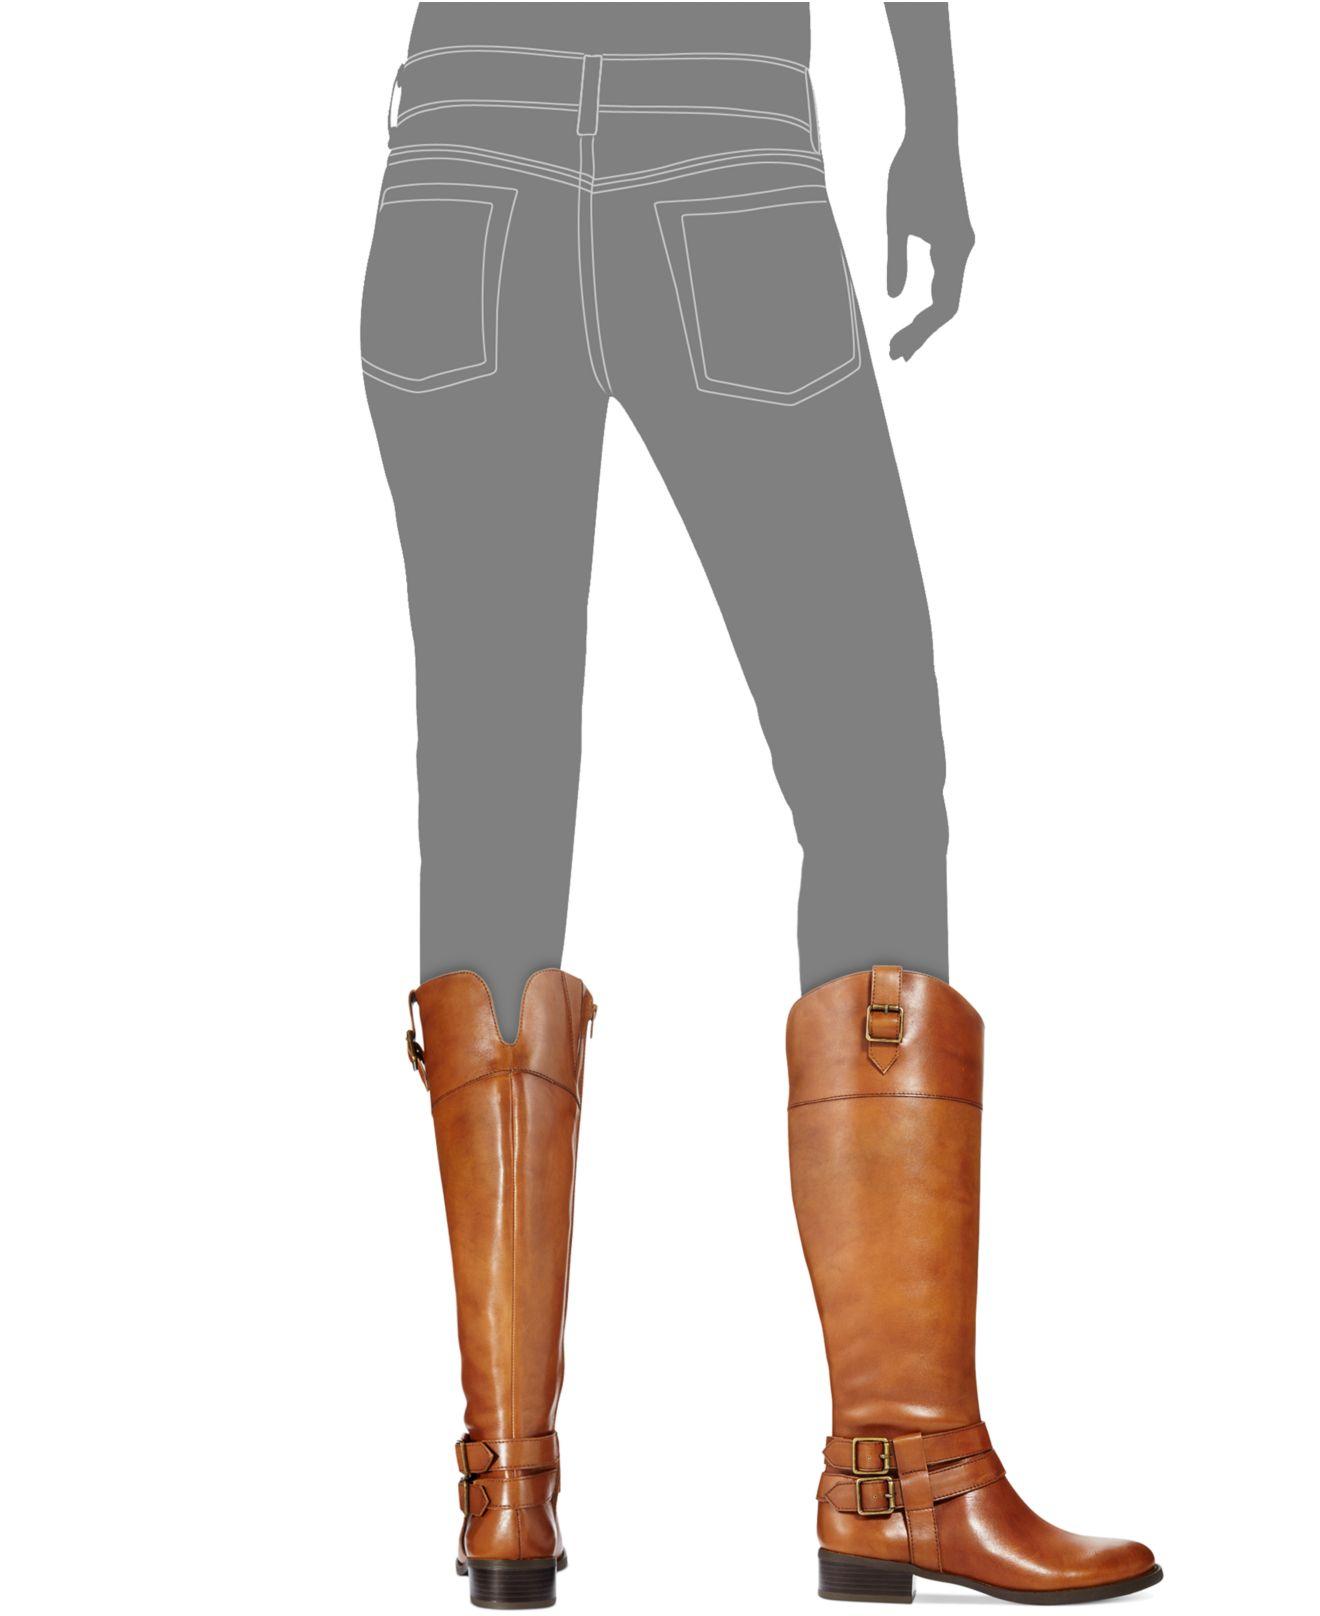 888a9e79e70 INC International Concepts Brown Fahnee Wide-Leg Leather Riding Boots